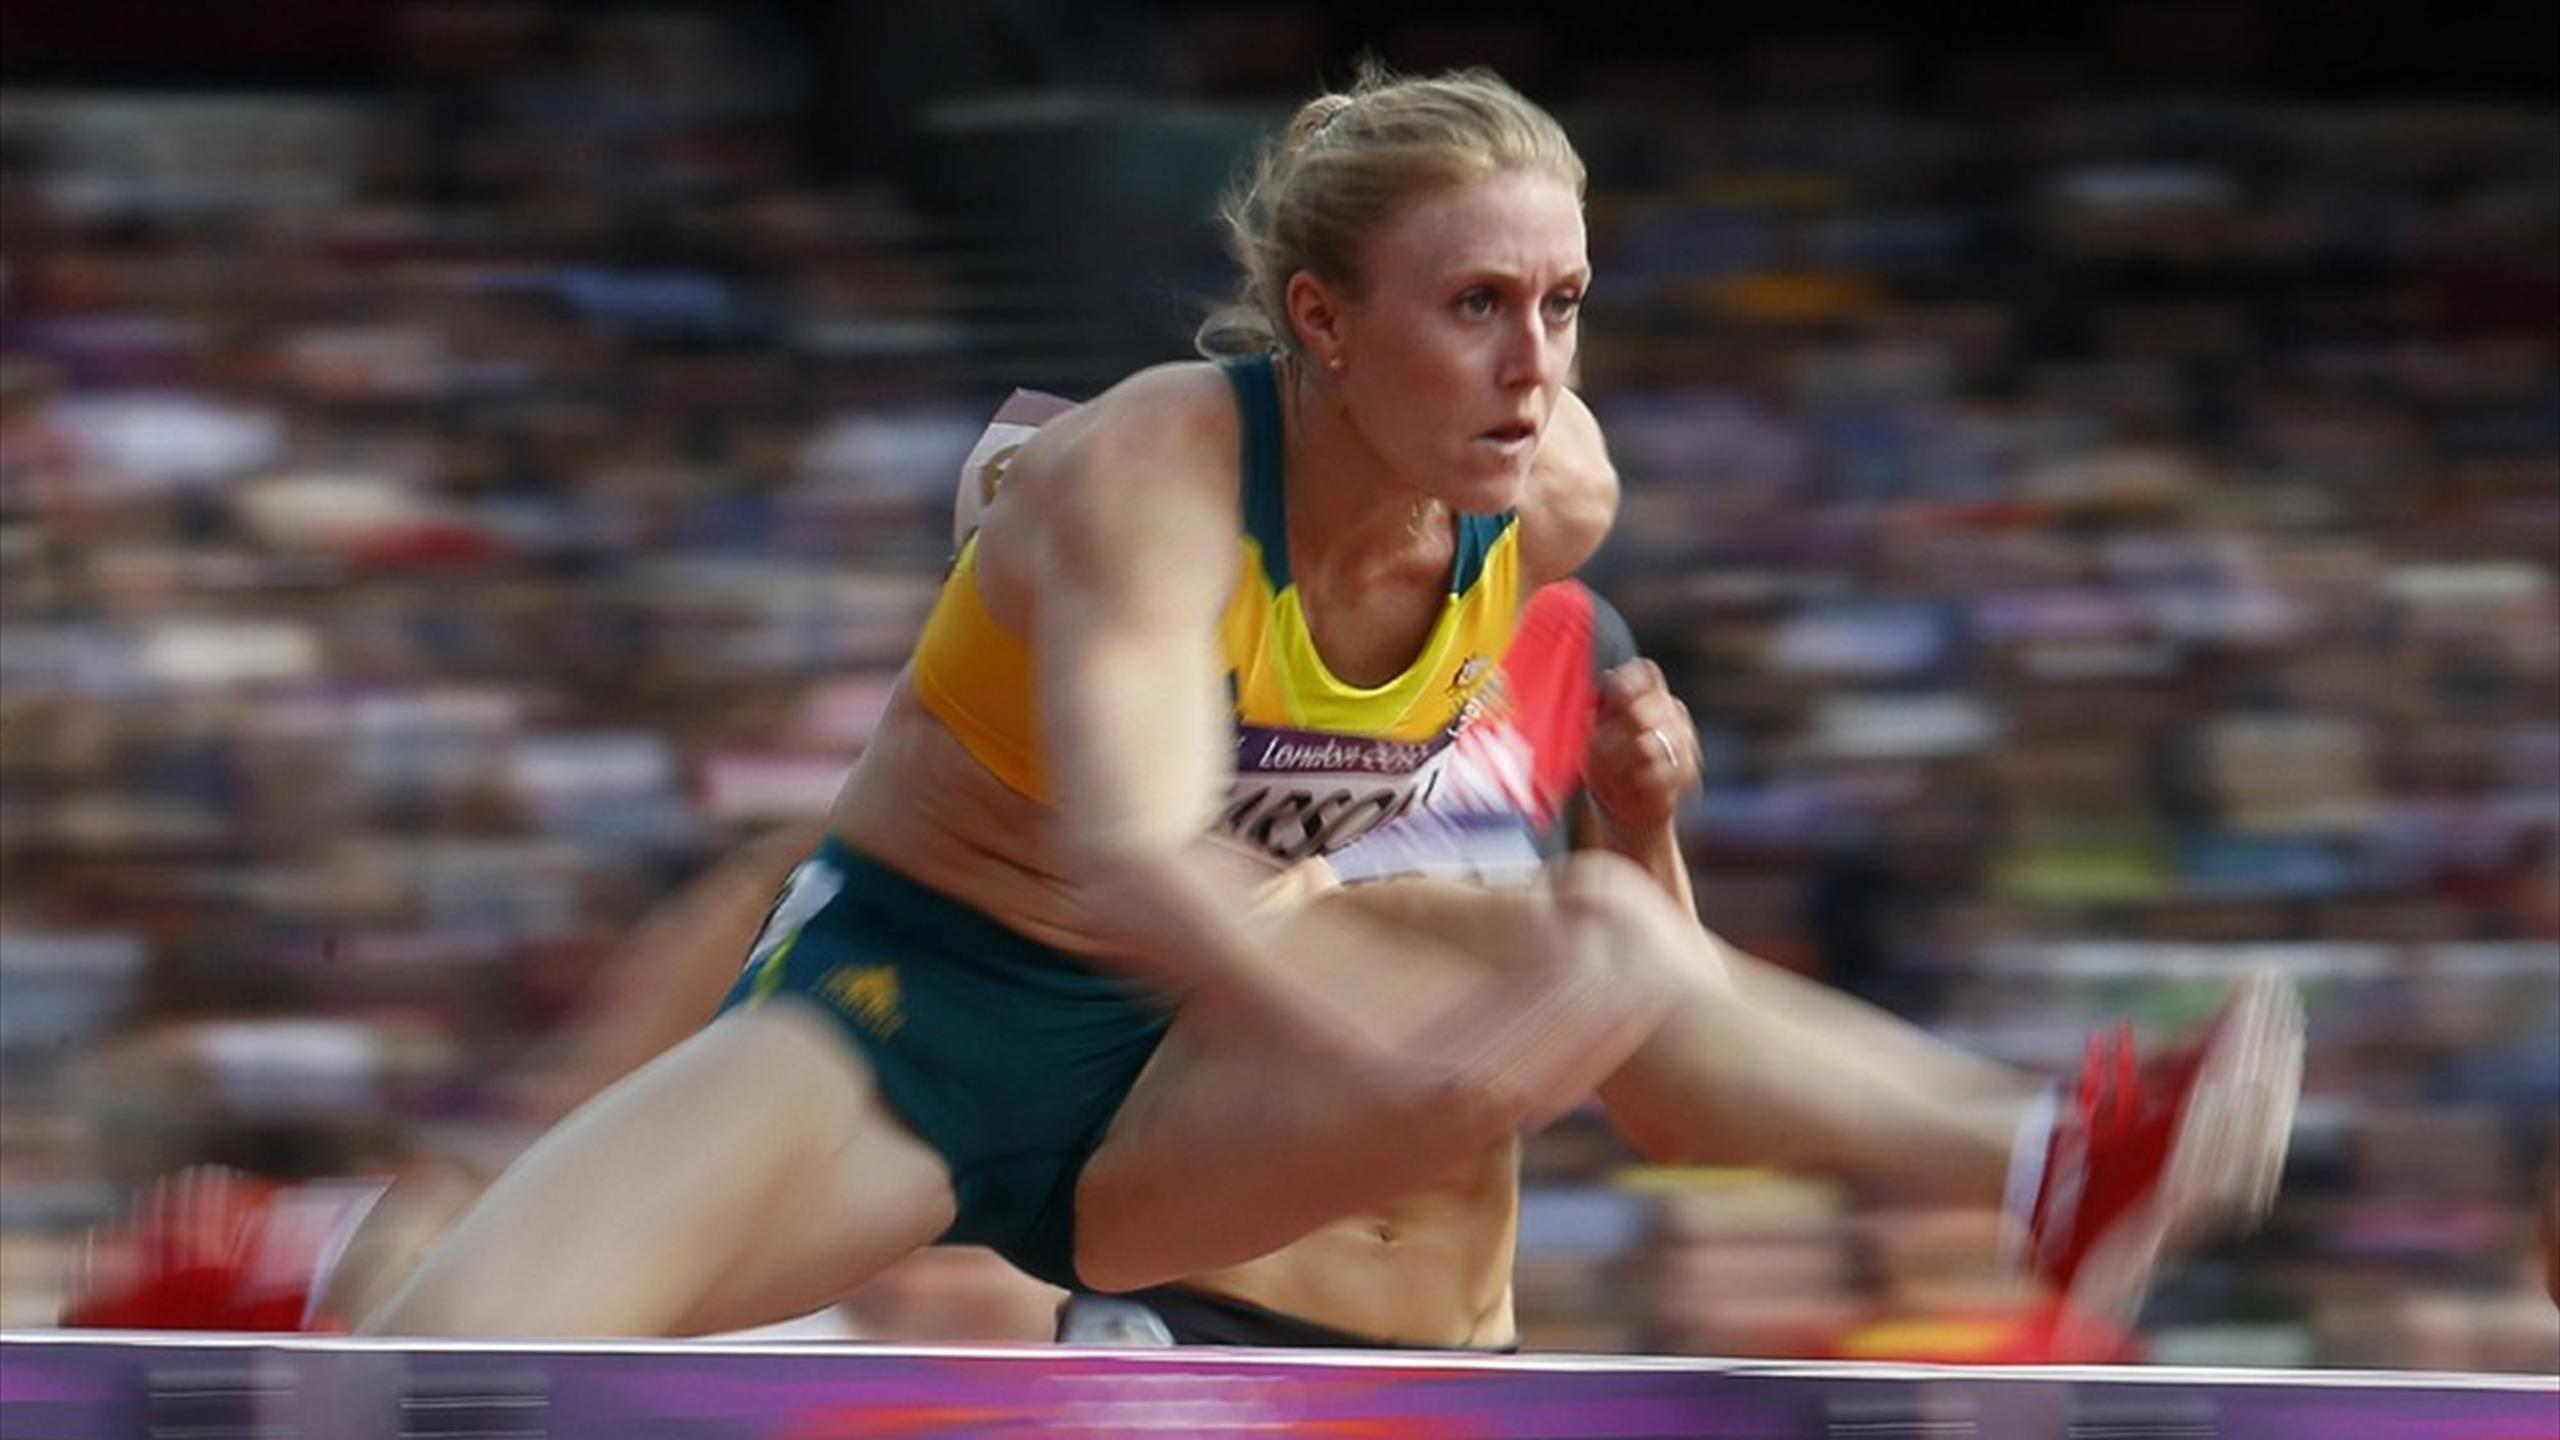 olympic hurdler pearson - 900×577